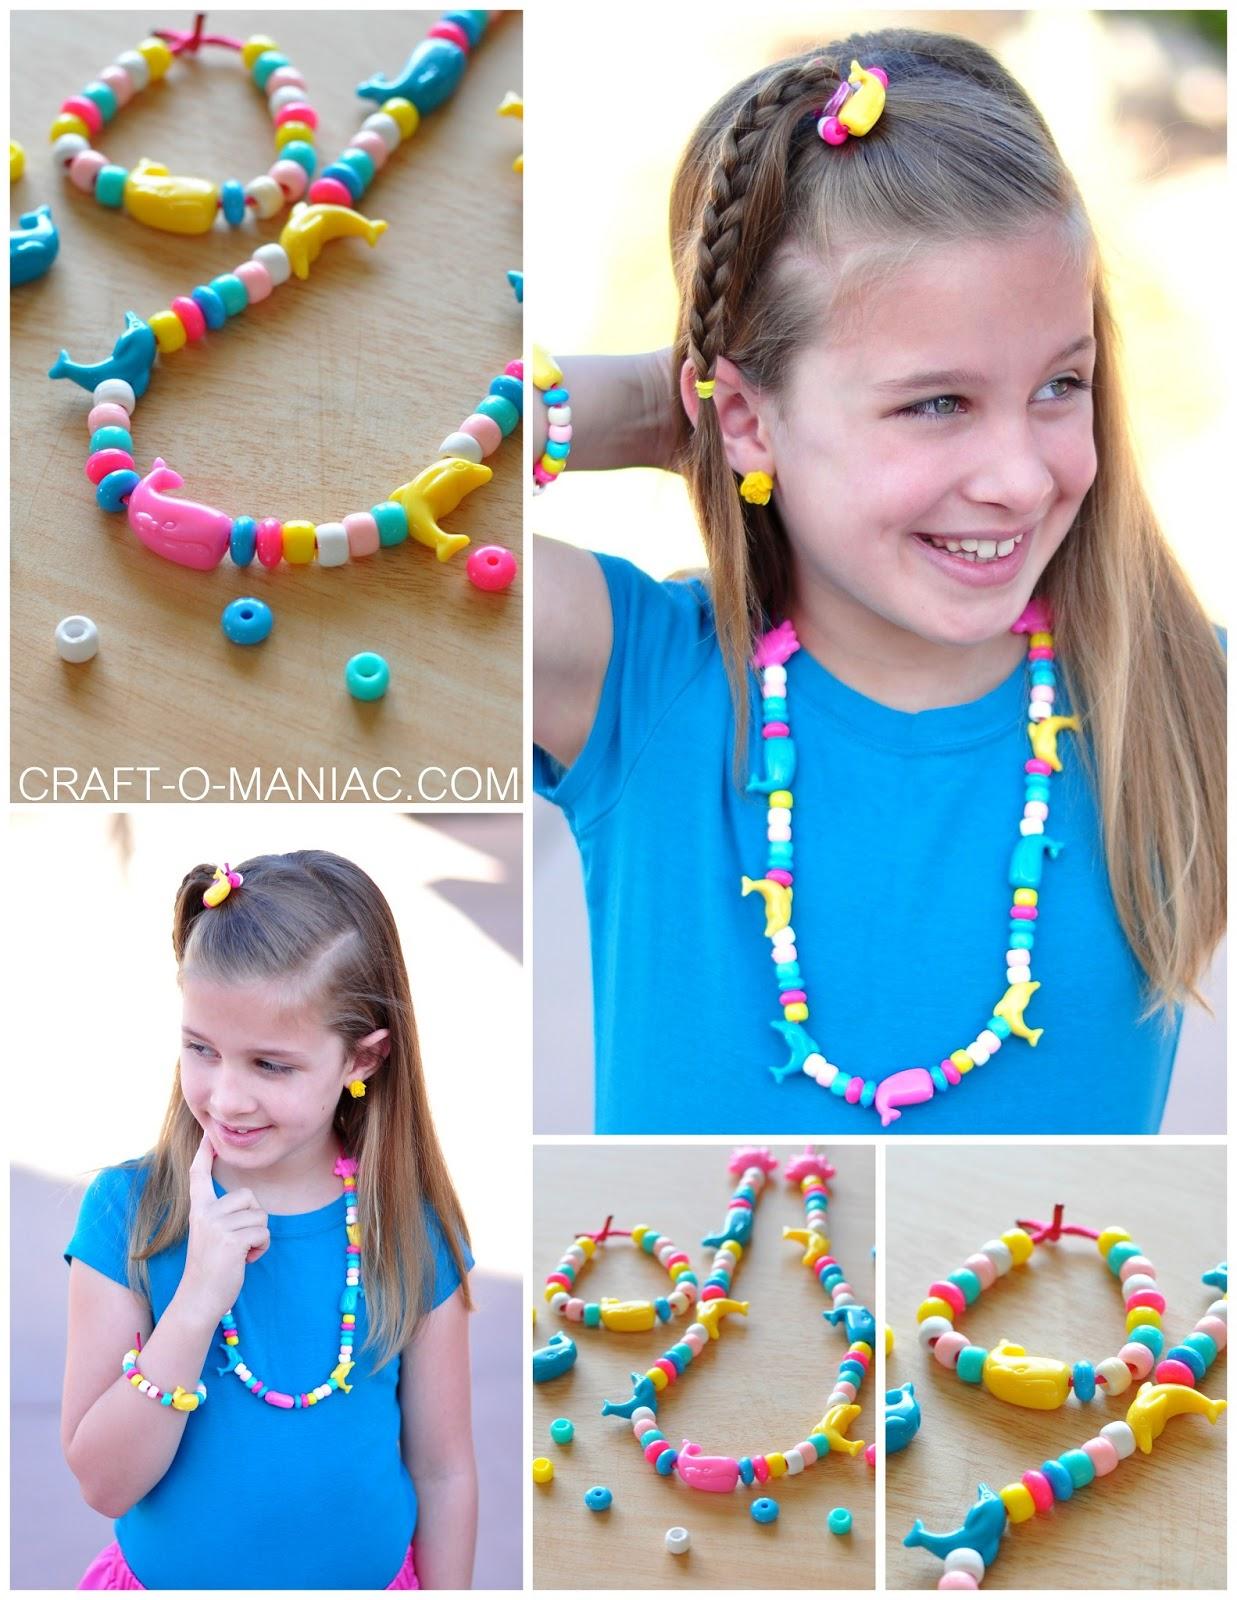 Joann S Summer Of Kids Craft Beaded Jewelry Craft O Maniac